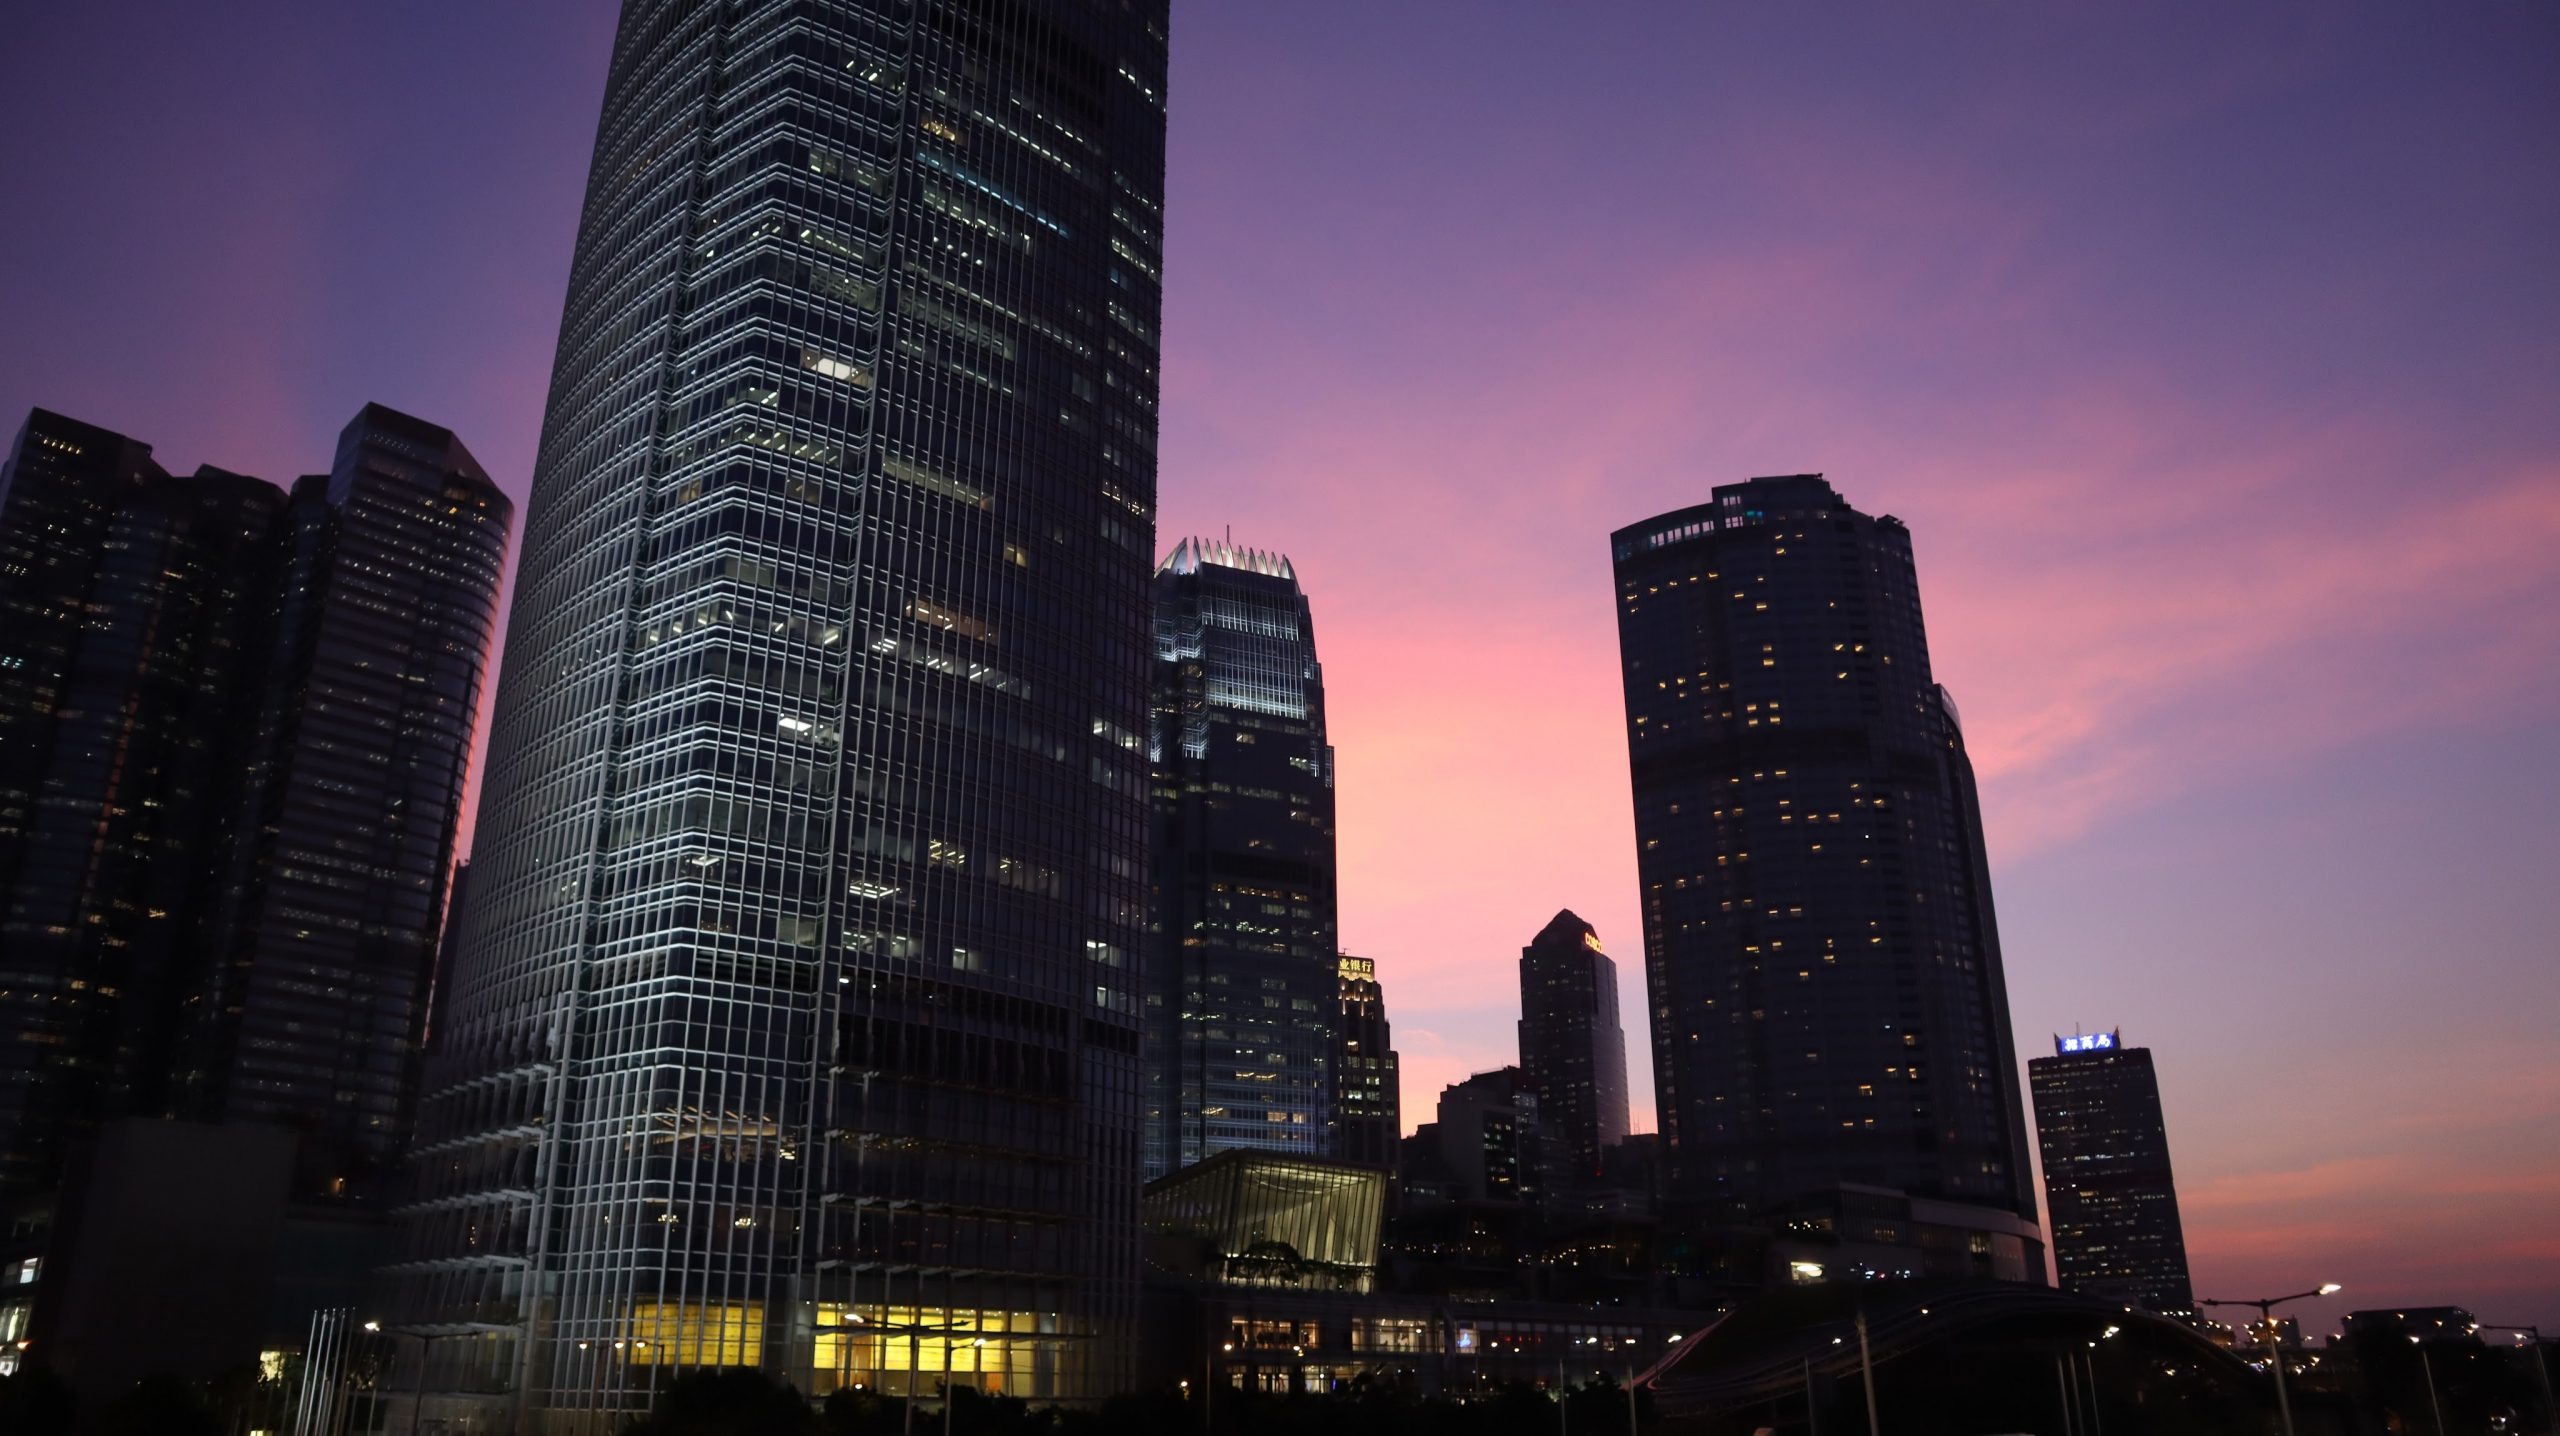 [香港] 中環晚霞餘暉.隨心攝 Twilight in Central